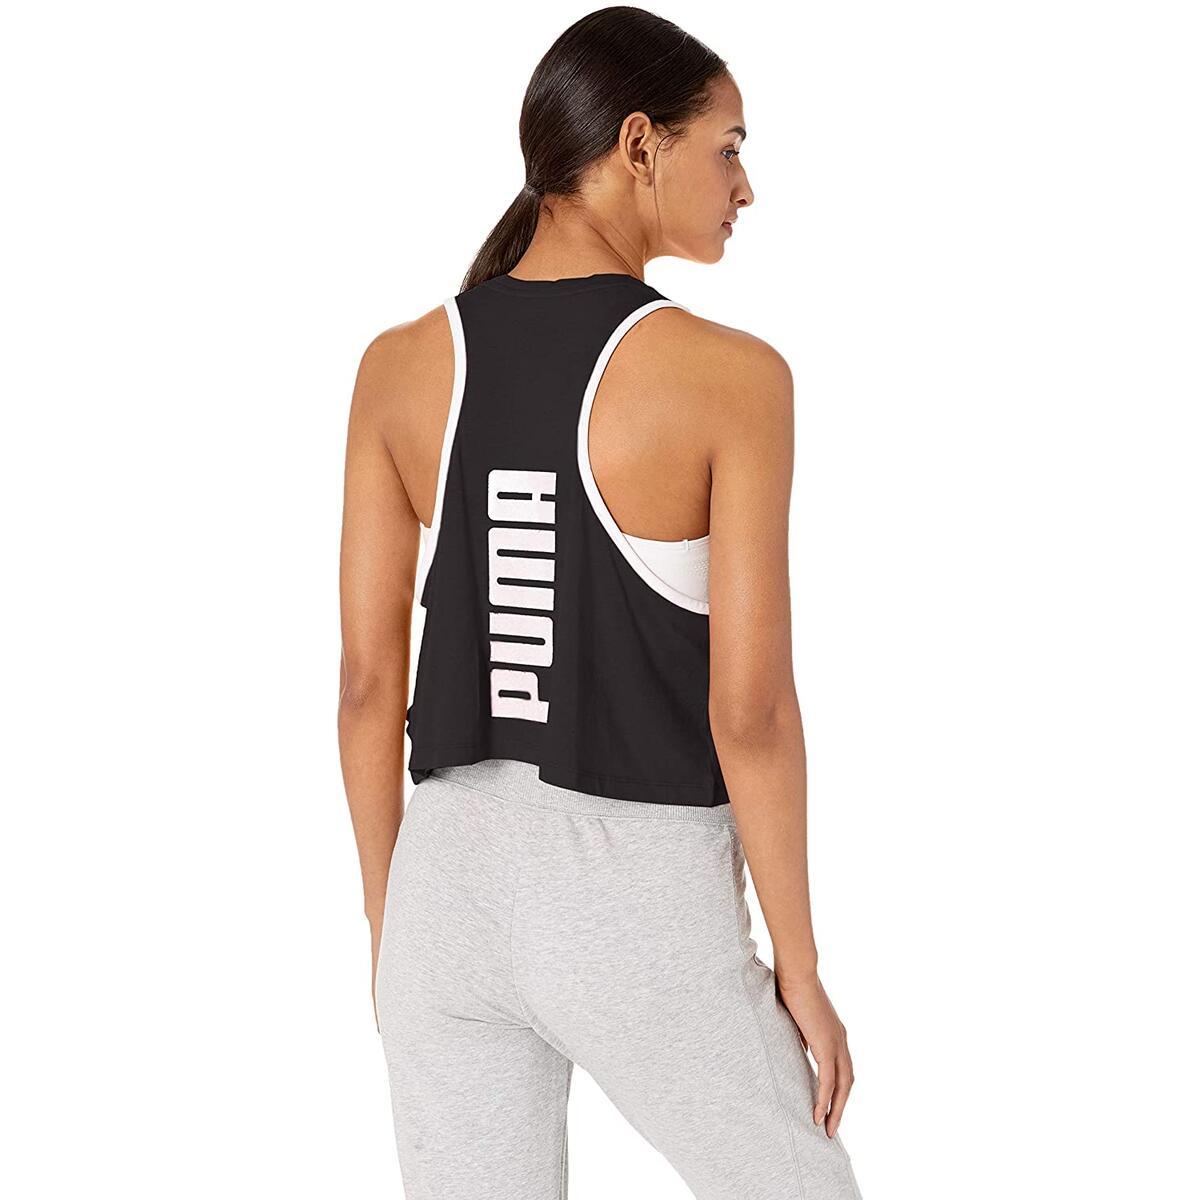 PUMA Women's Summer Tank Top - Black, Large